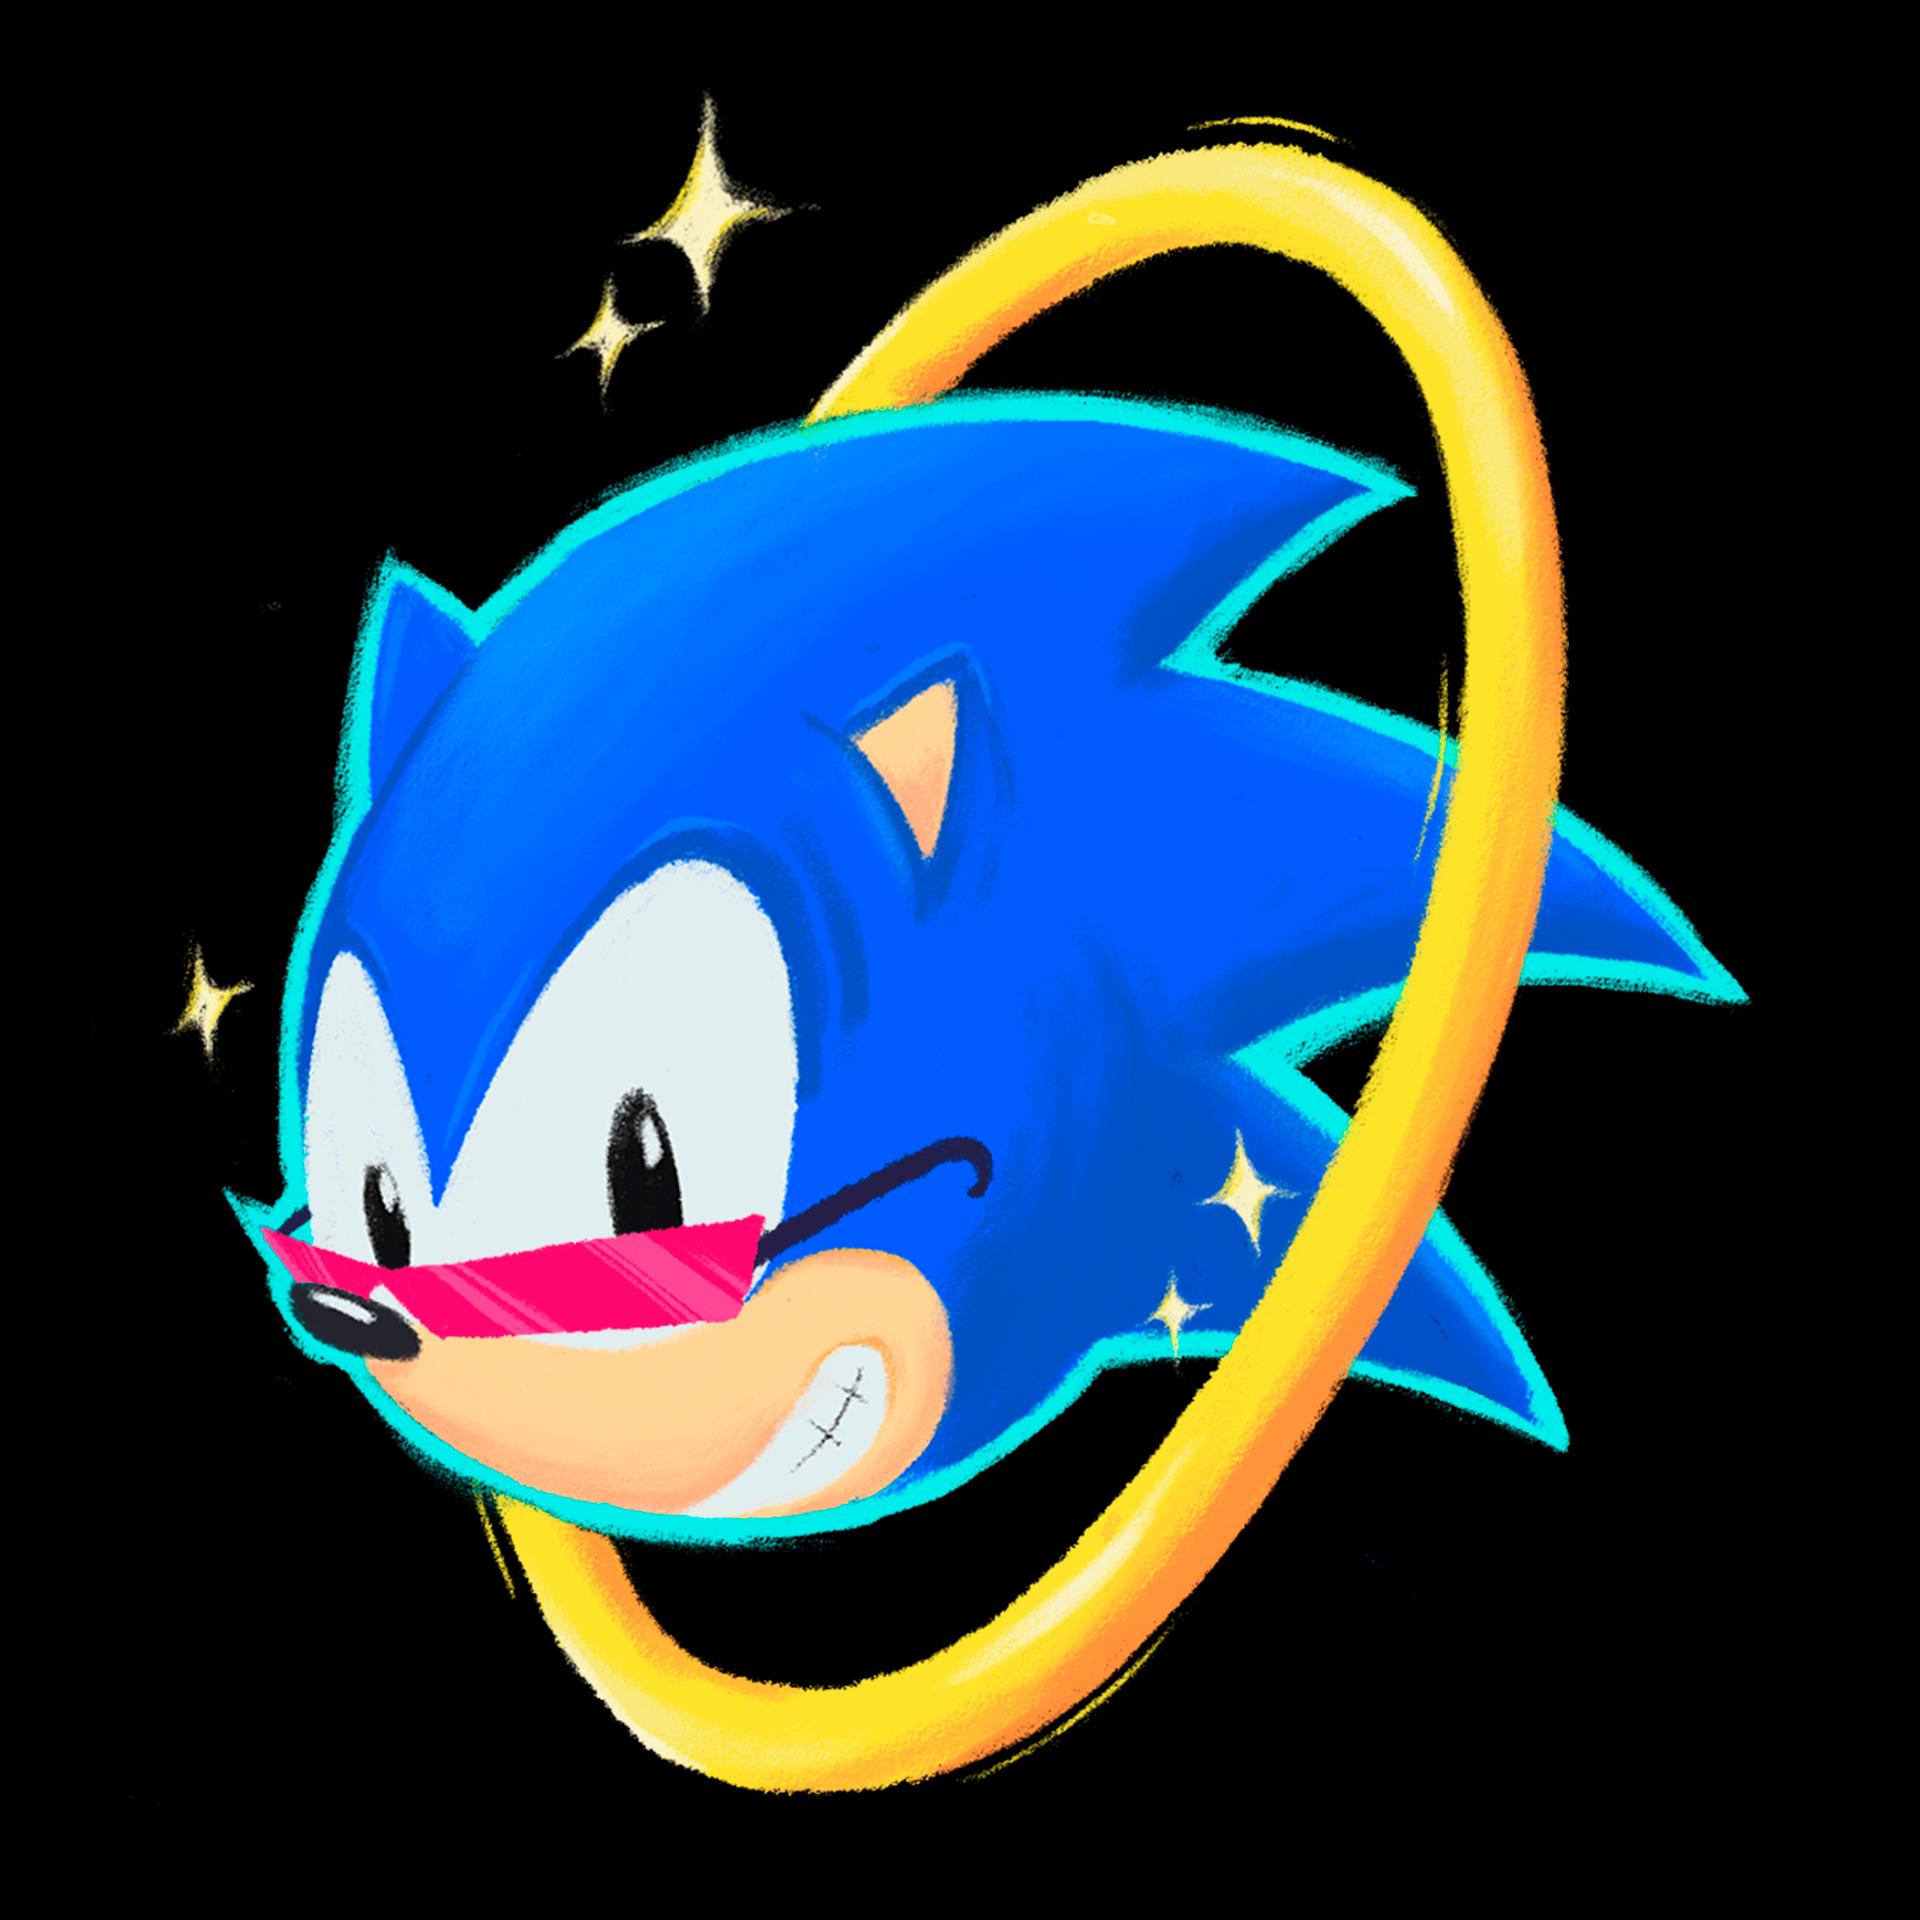 Sonic The Hedgehog FANART